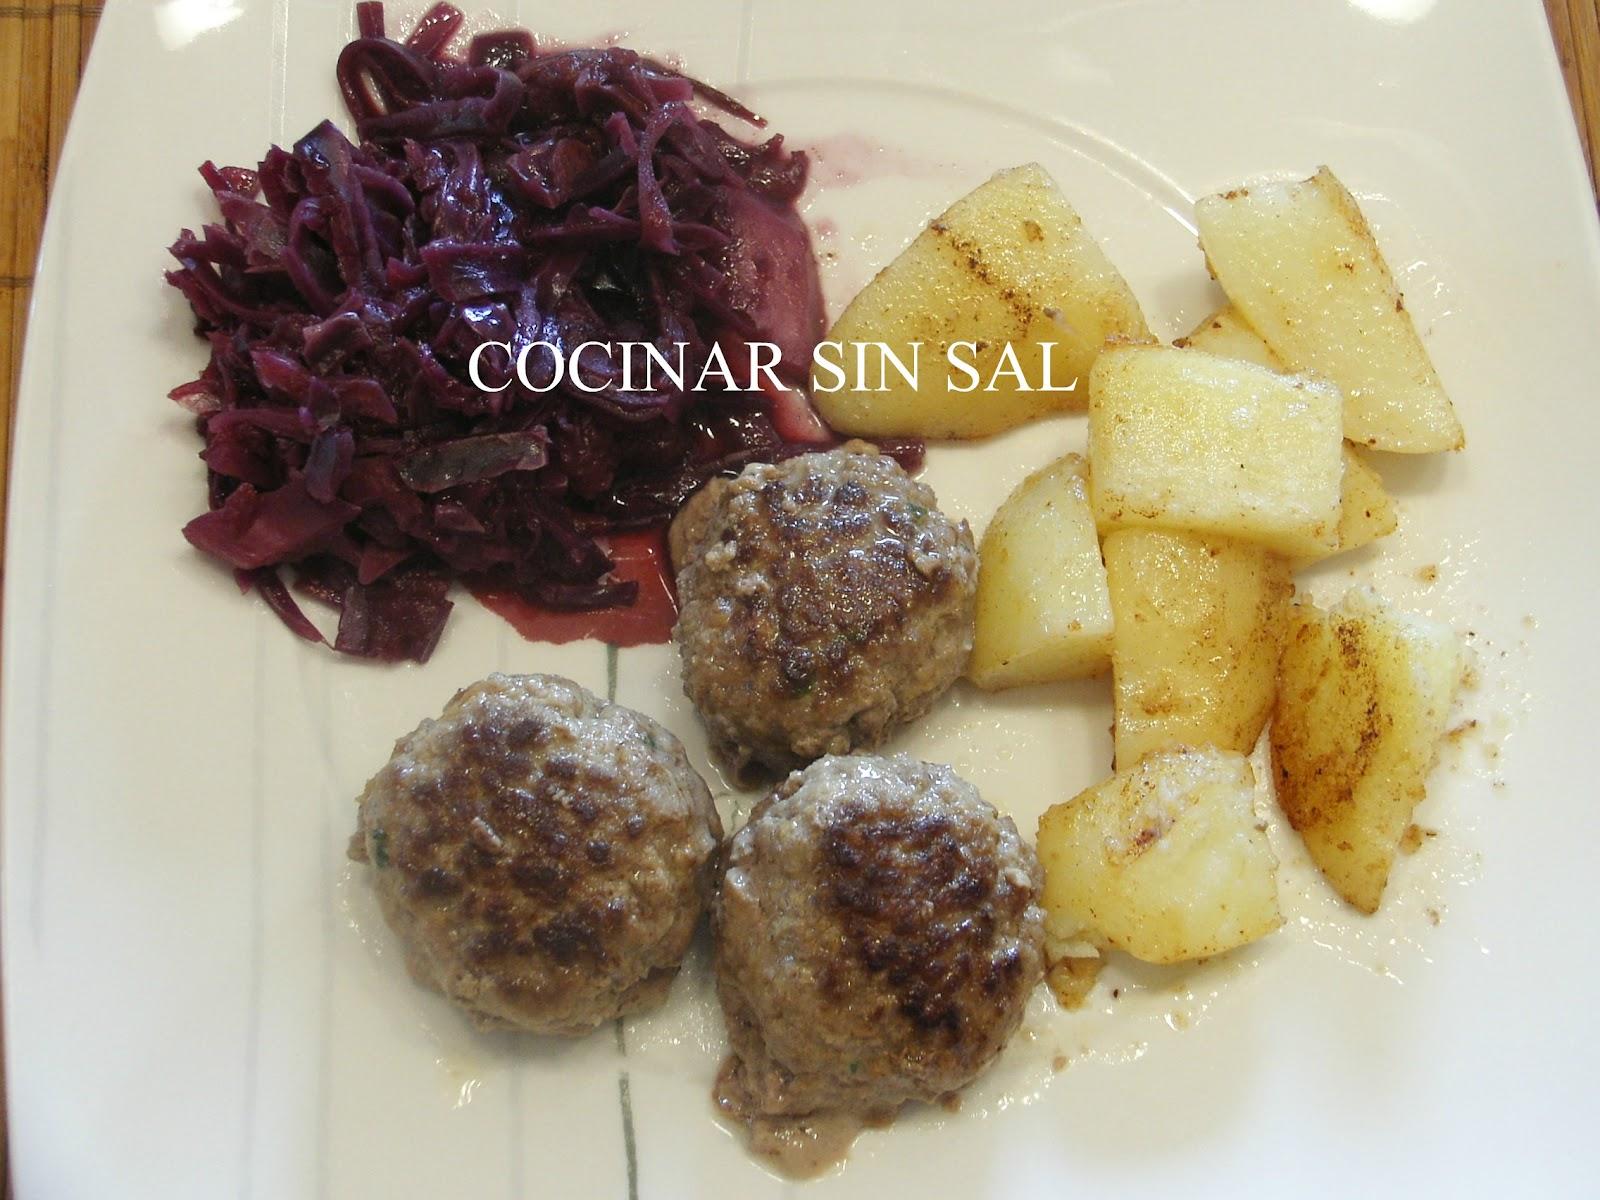 Cocinar sin sal lombarda con manzana sin sal - Cocinar sin sal ...